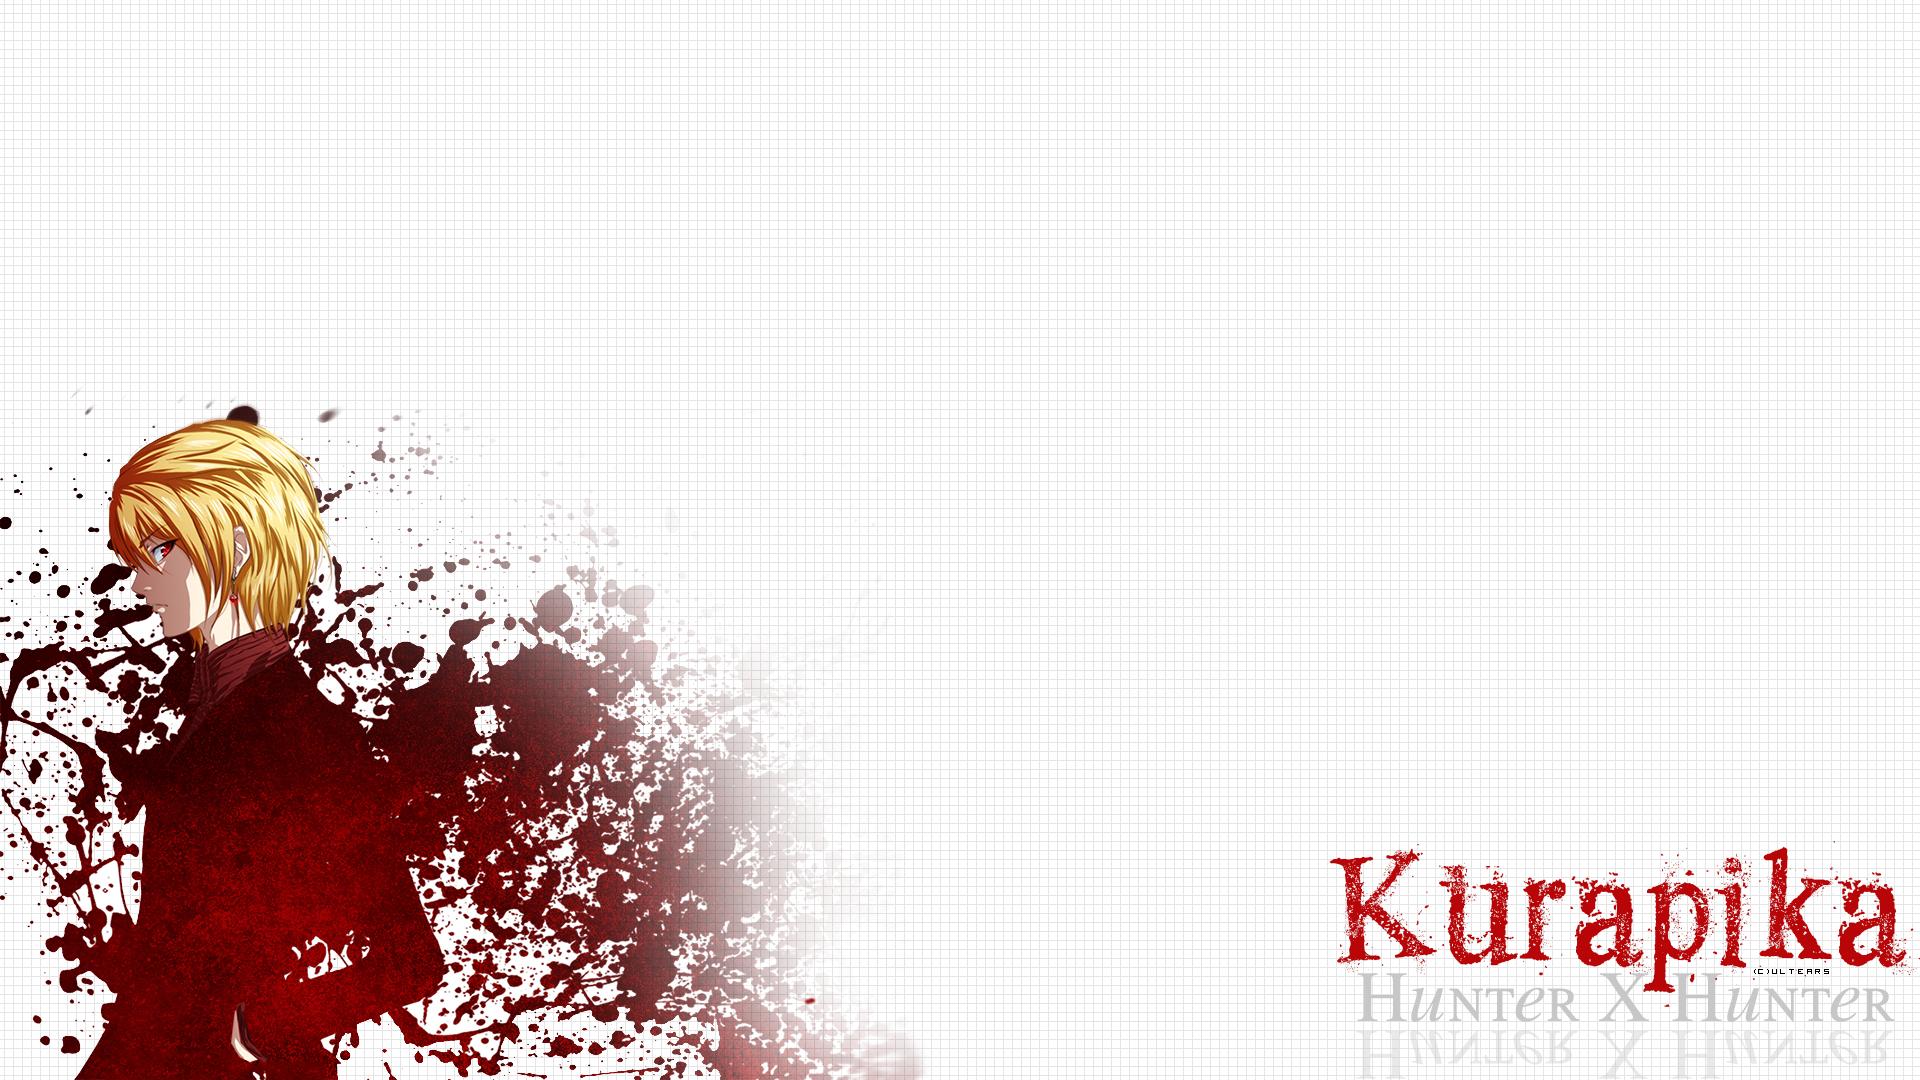 kurapika hunter x hunter wallpaper by ultears customization wallpaper    Kurapika Wallpaper Backgrounds